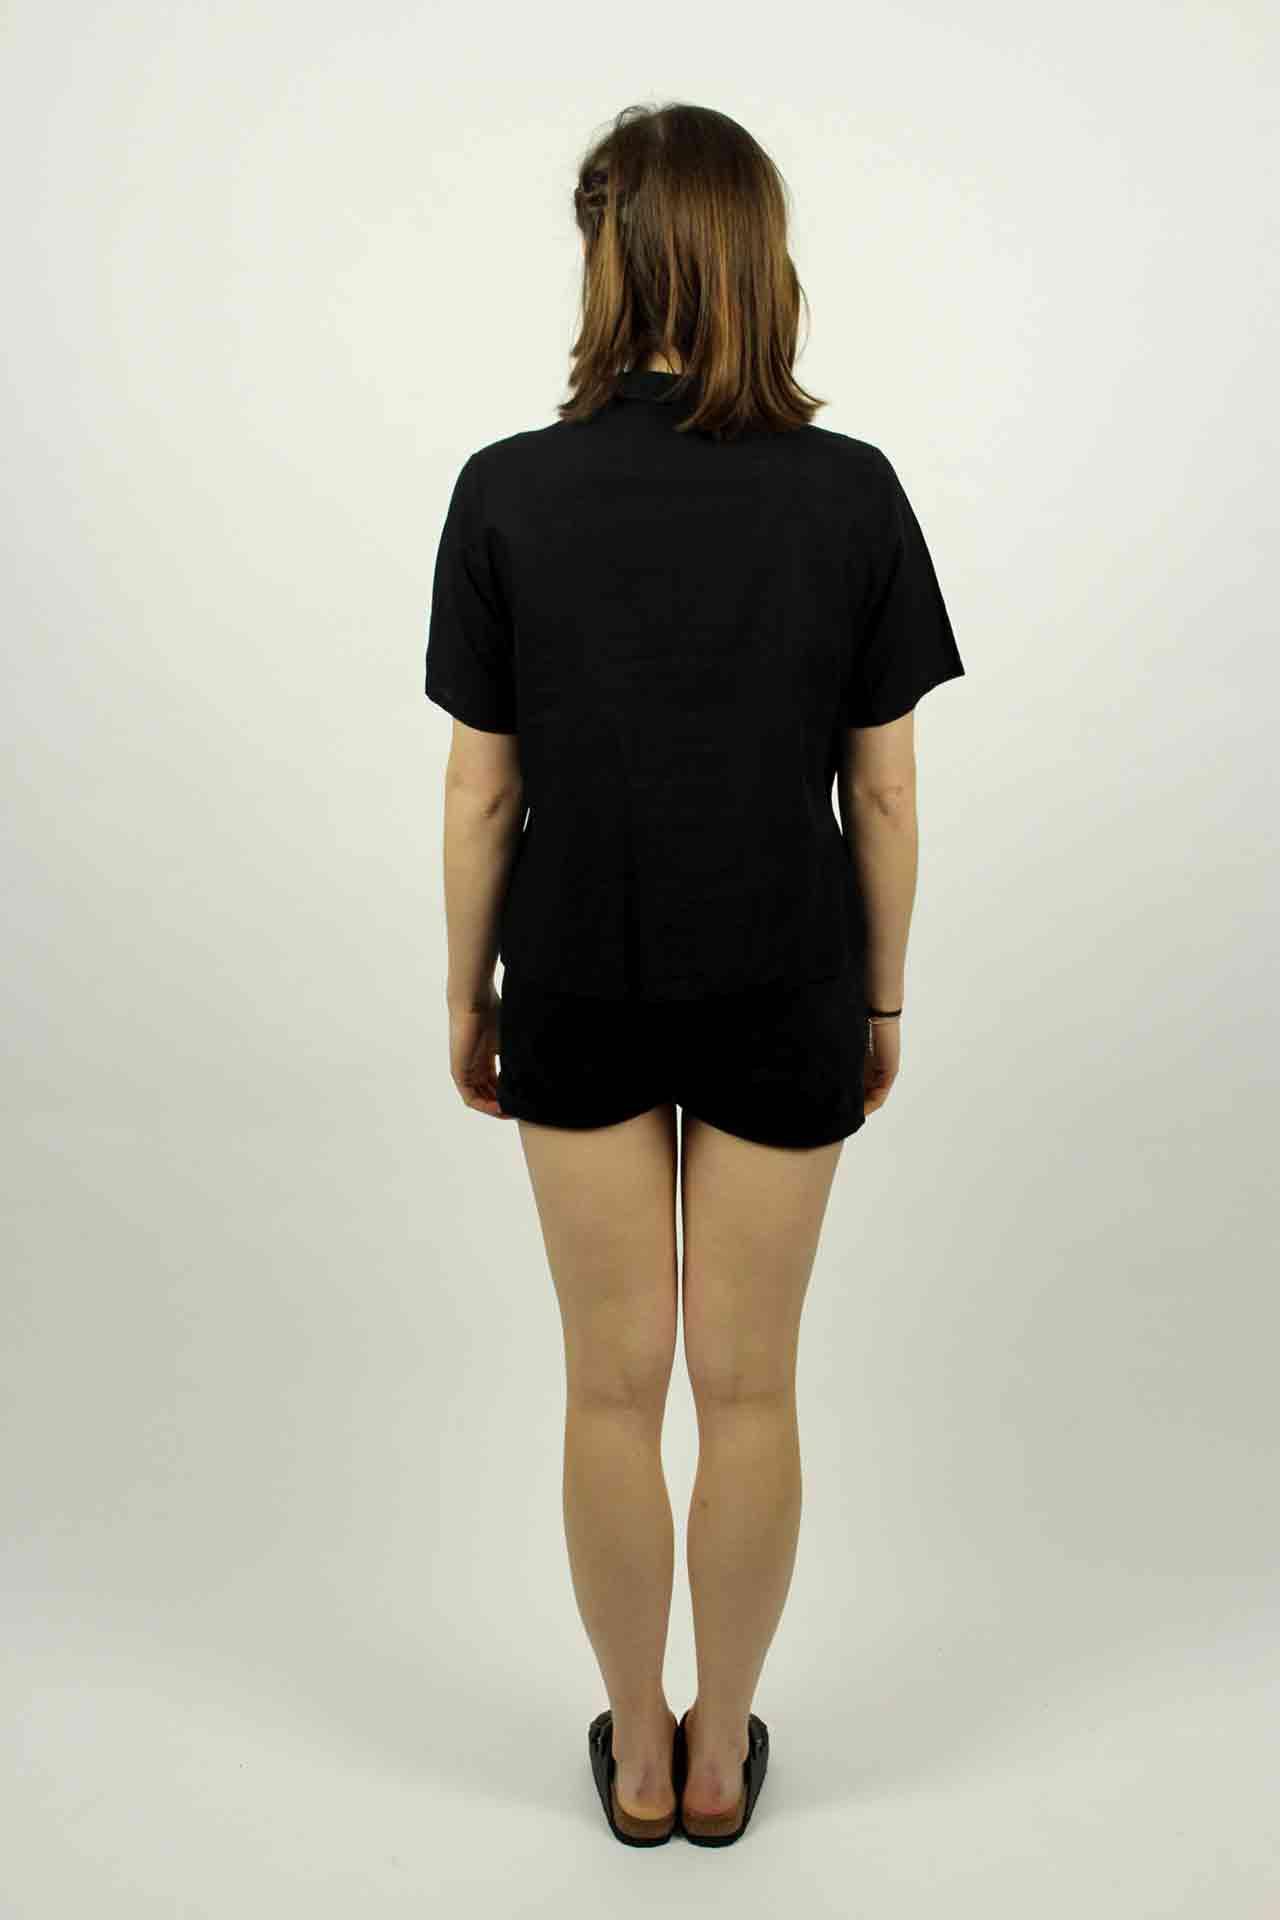 bluse schwarz kurzarm hertha oma klara. Black Bedroom Furniture Sets. Home Design Ideas